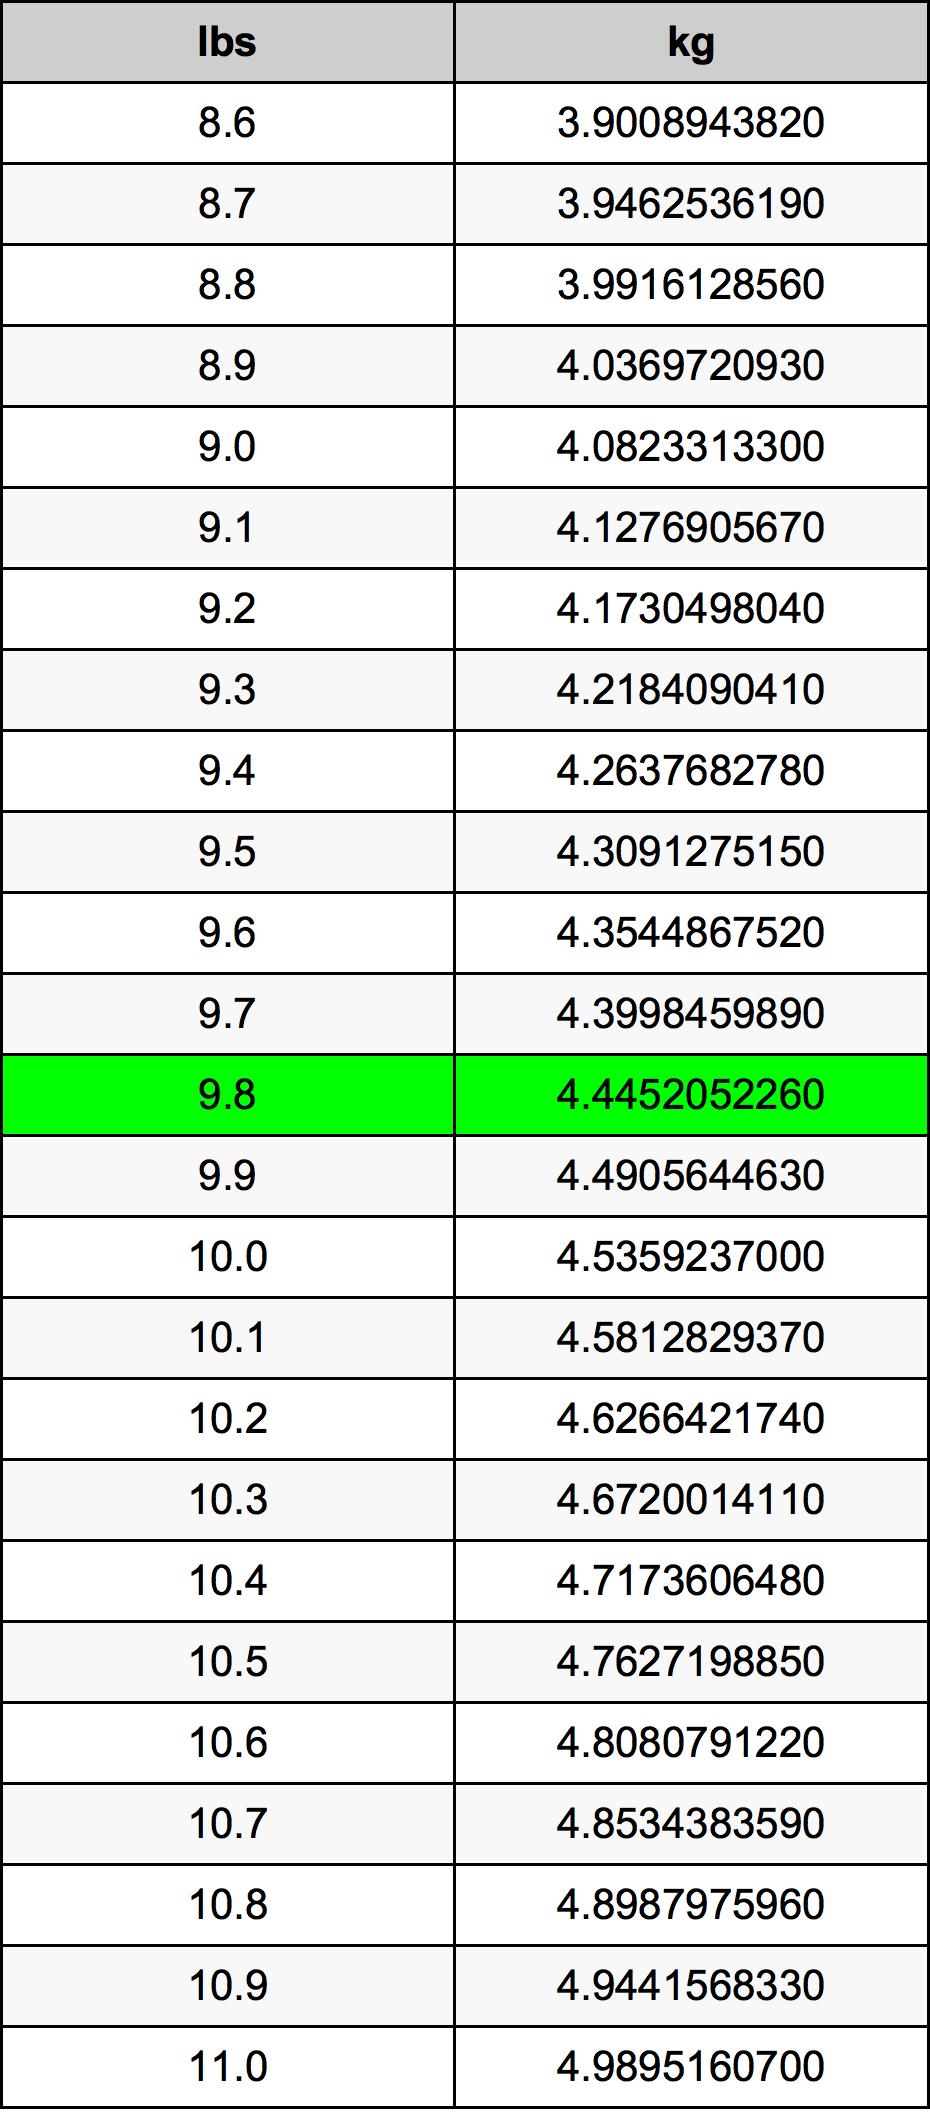 9.8 Libra konverteringstabellen